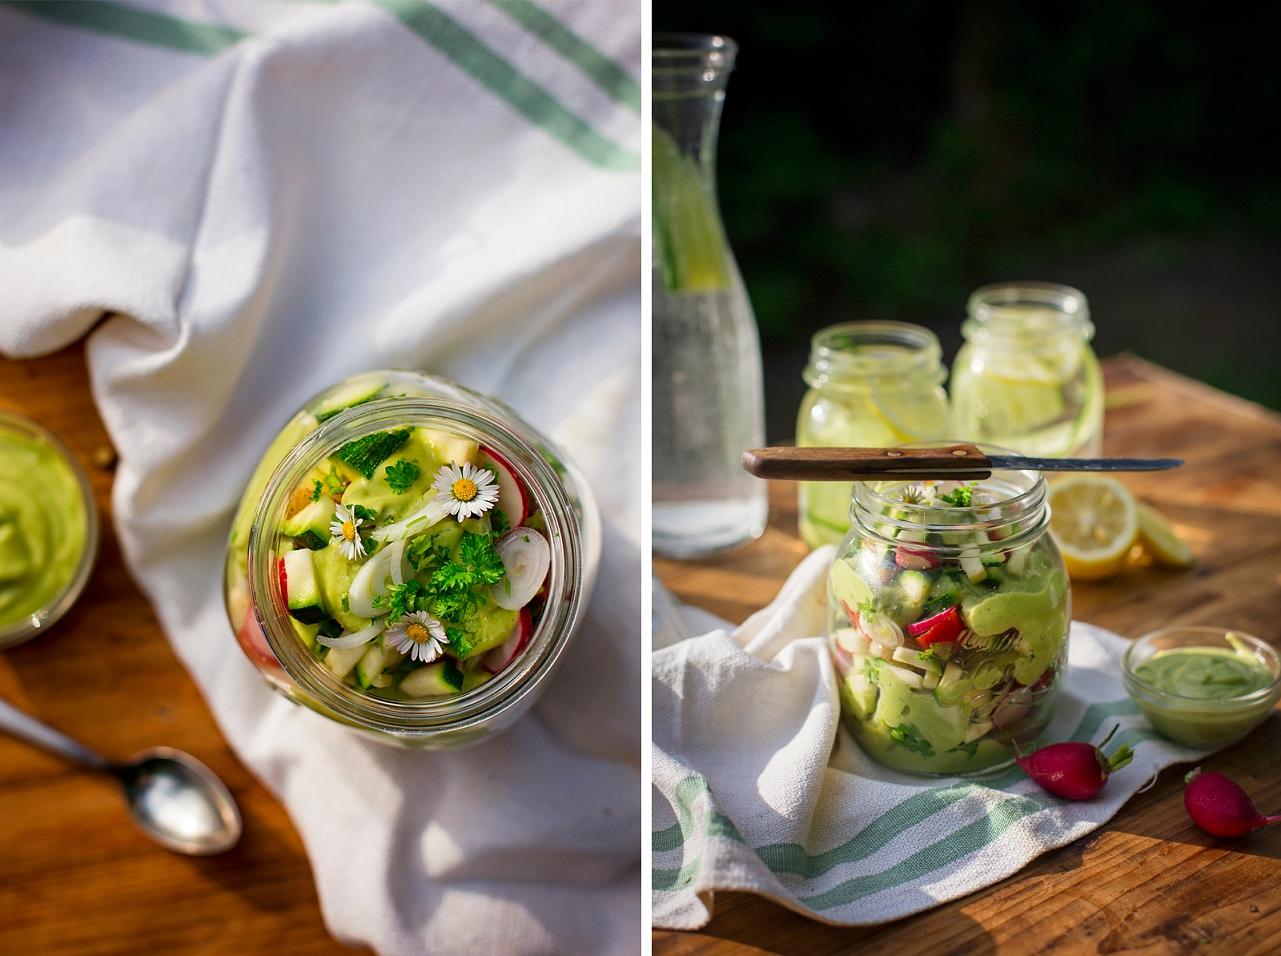 Salát s cuketou a avokádovým dresinkem, okurková limonáda